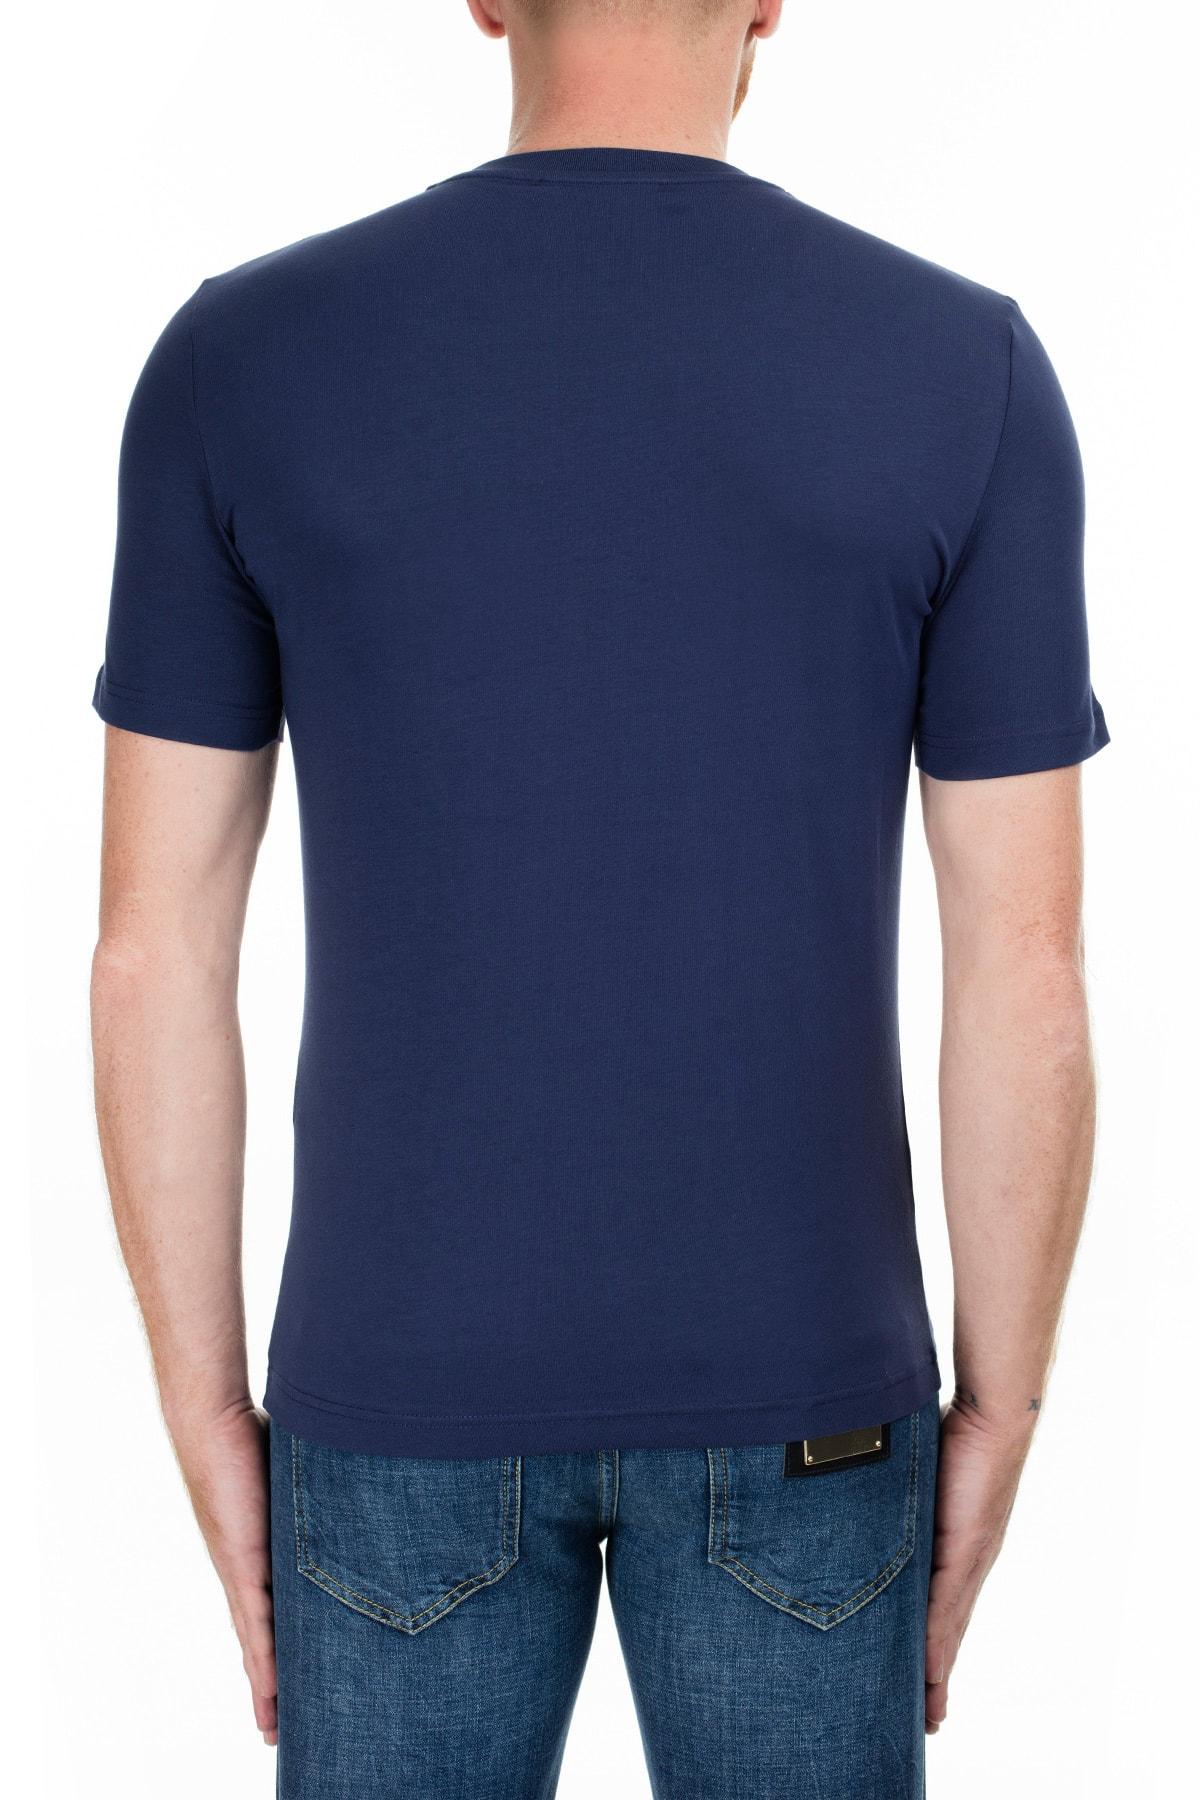 Love Moschino Erkek Lacivert T-Shirt S M47312Le1811 Y61 2